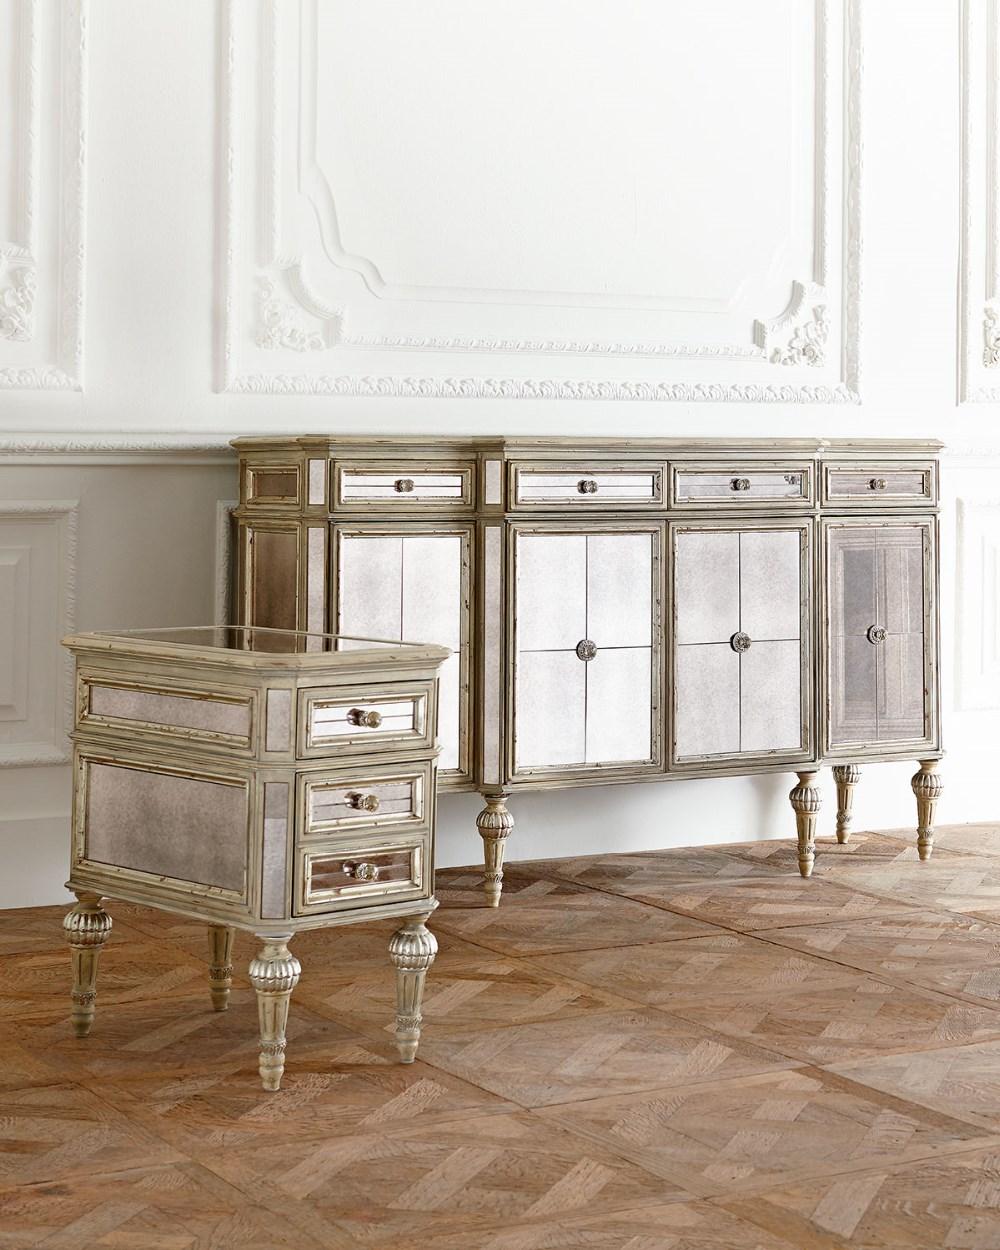 Harga Grosir Antik Rumah Cermin Furniture